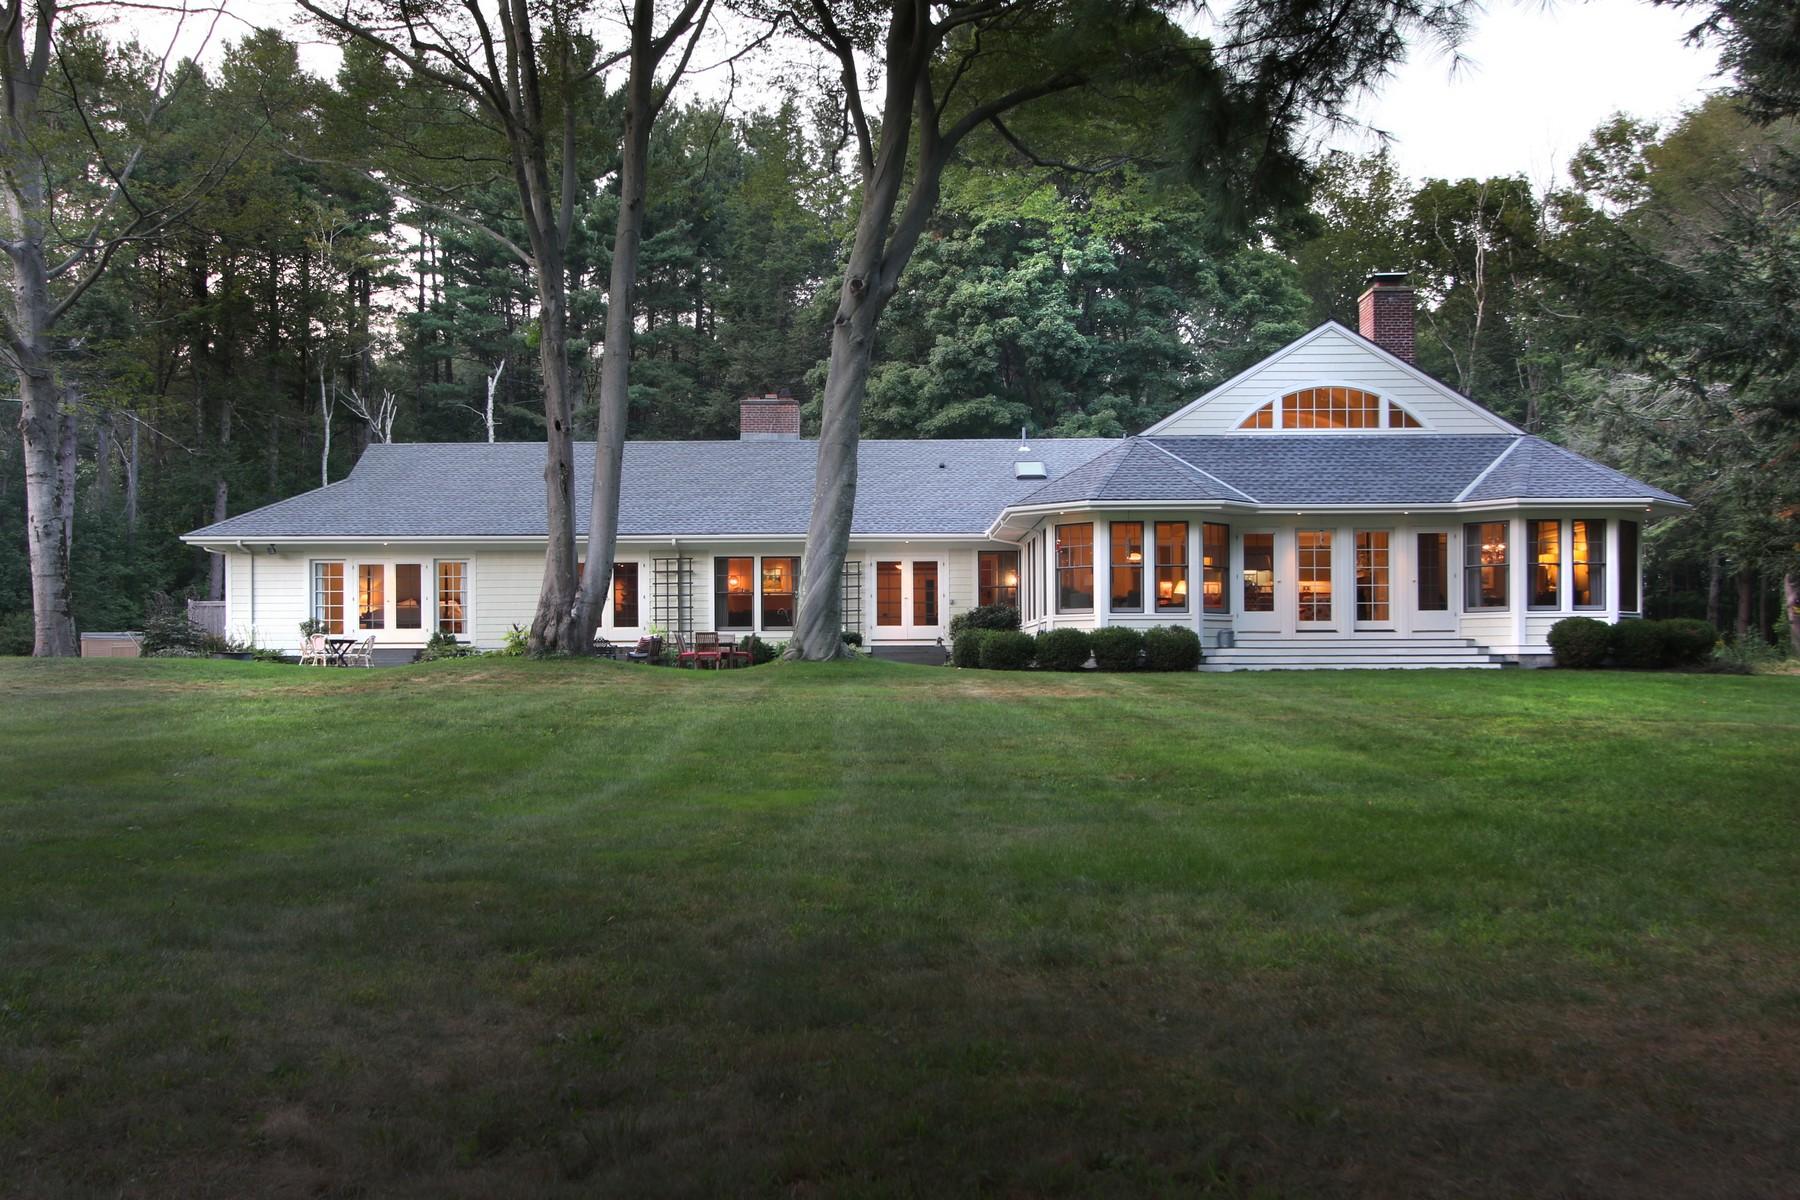 Moradia para Venda às Amidst Pristine New England Landscape 28 Old Concord Road Lincoln, Massachusetts 01773 Estados Unidos